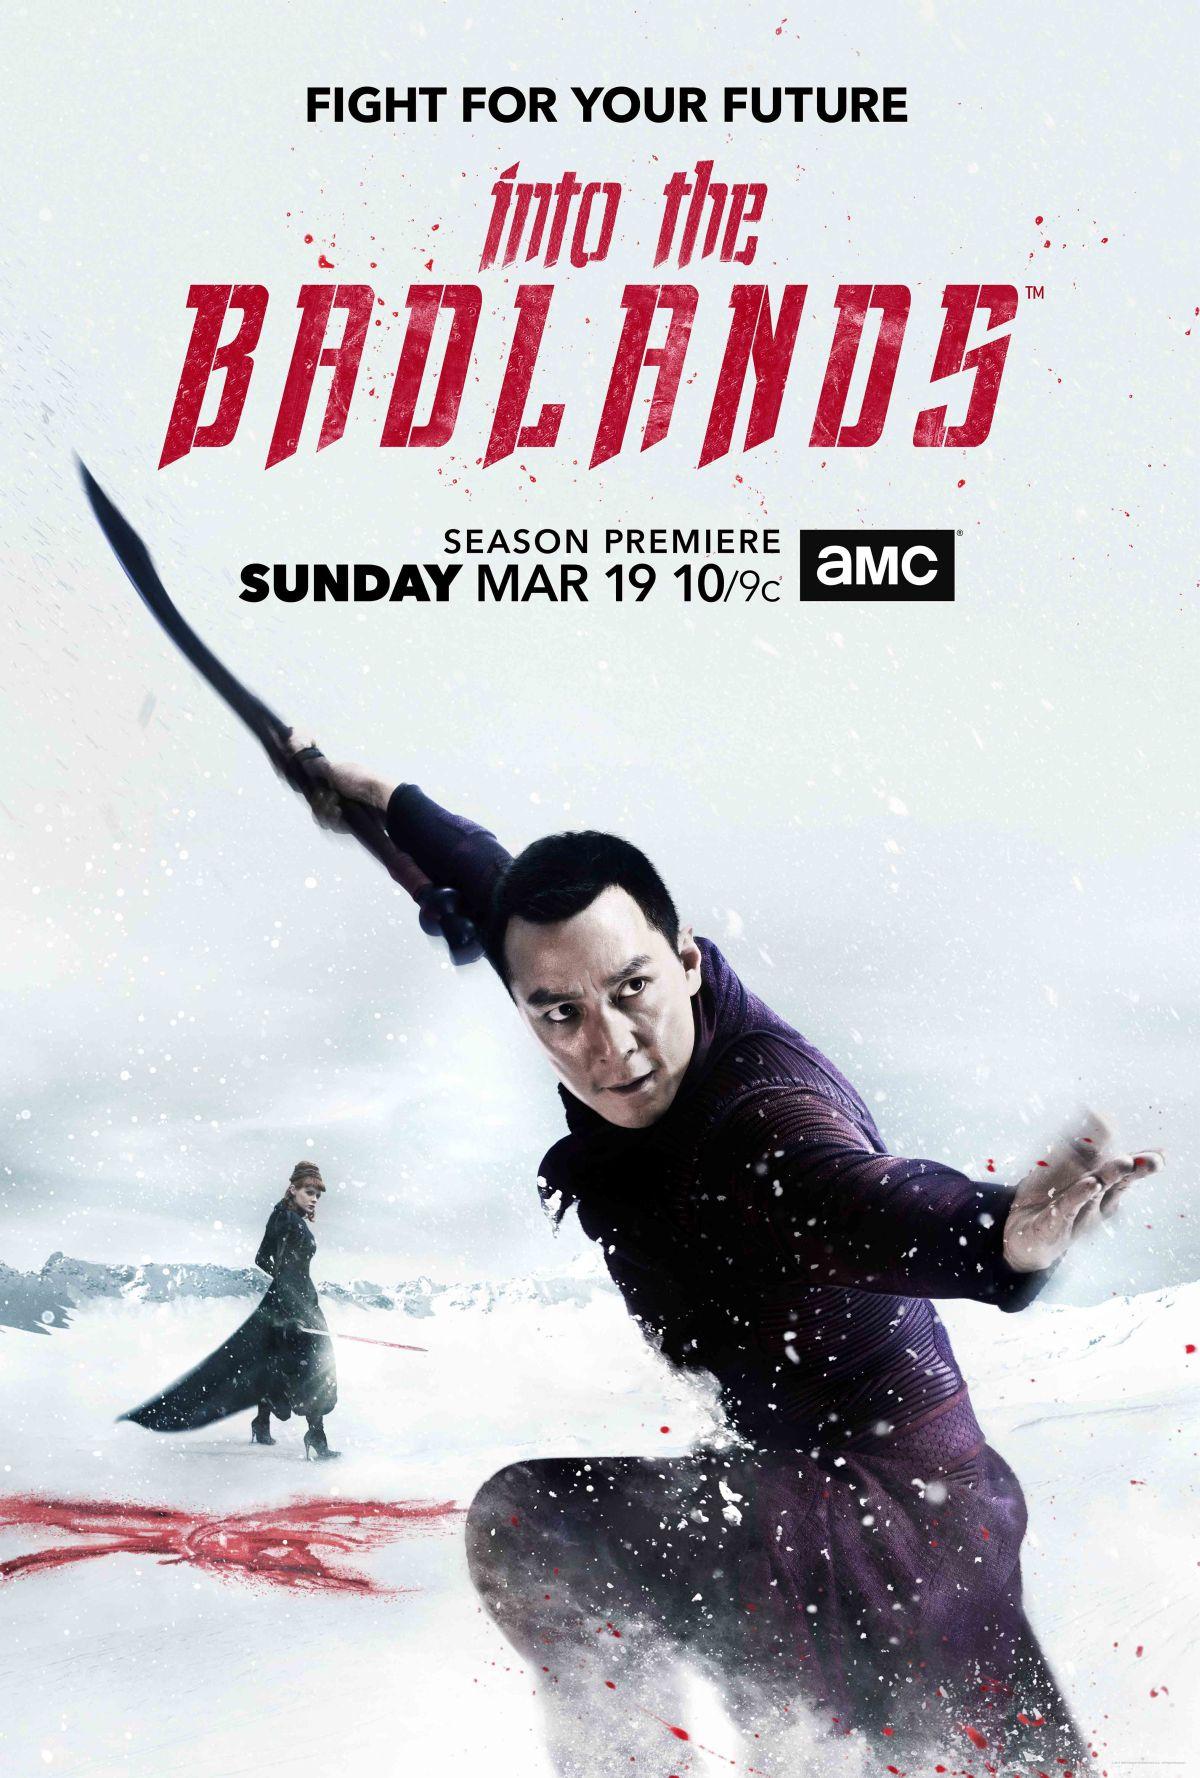 Into the Badlands Staffel 2 Start & Poster